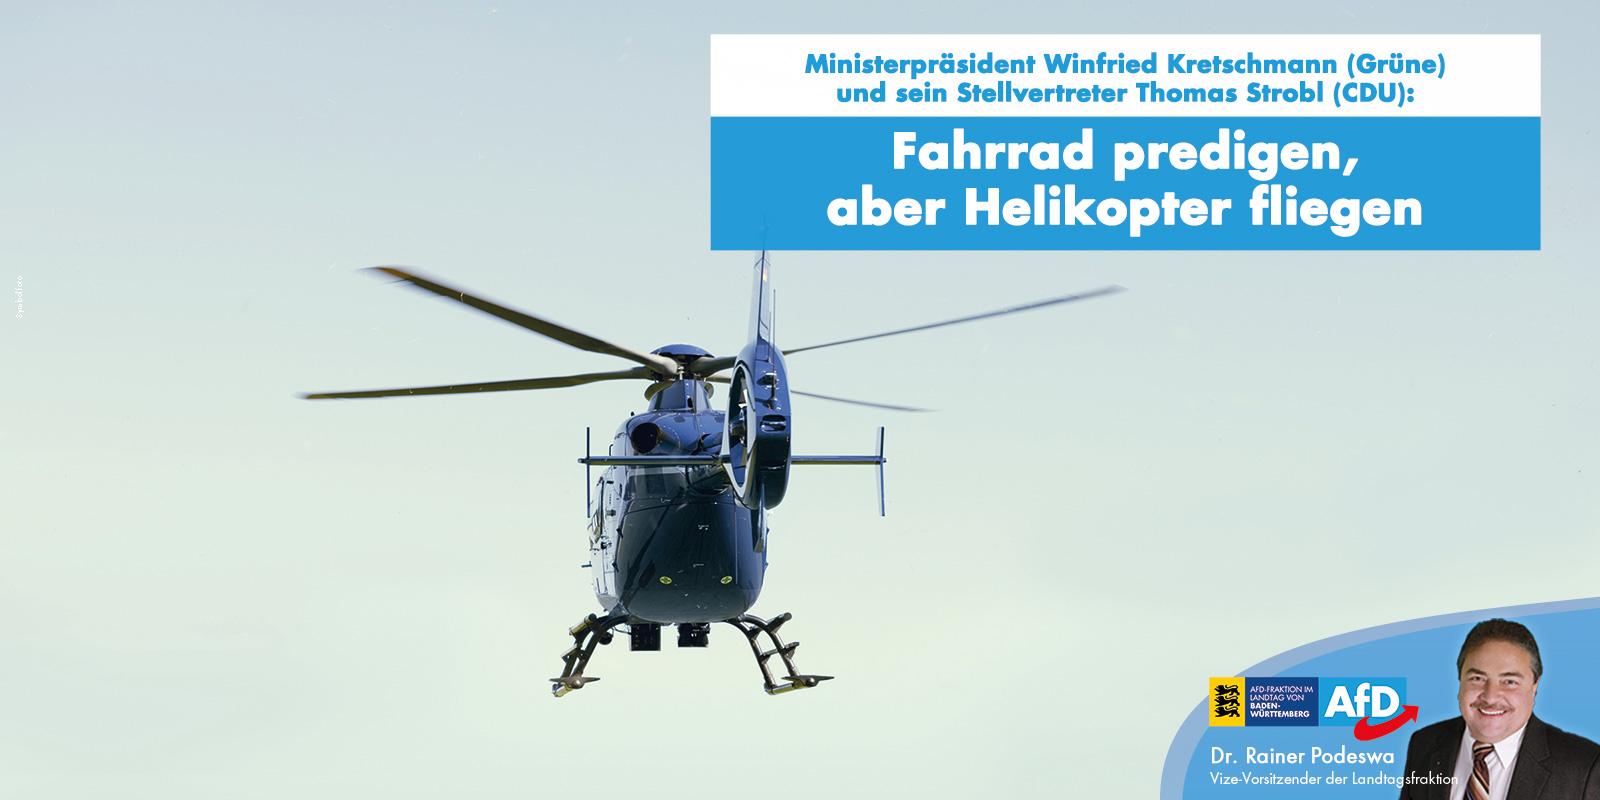 Dr. Rainer Podeswa: Fahrrad predigen, aber Helikopter fliegen